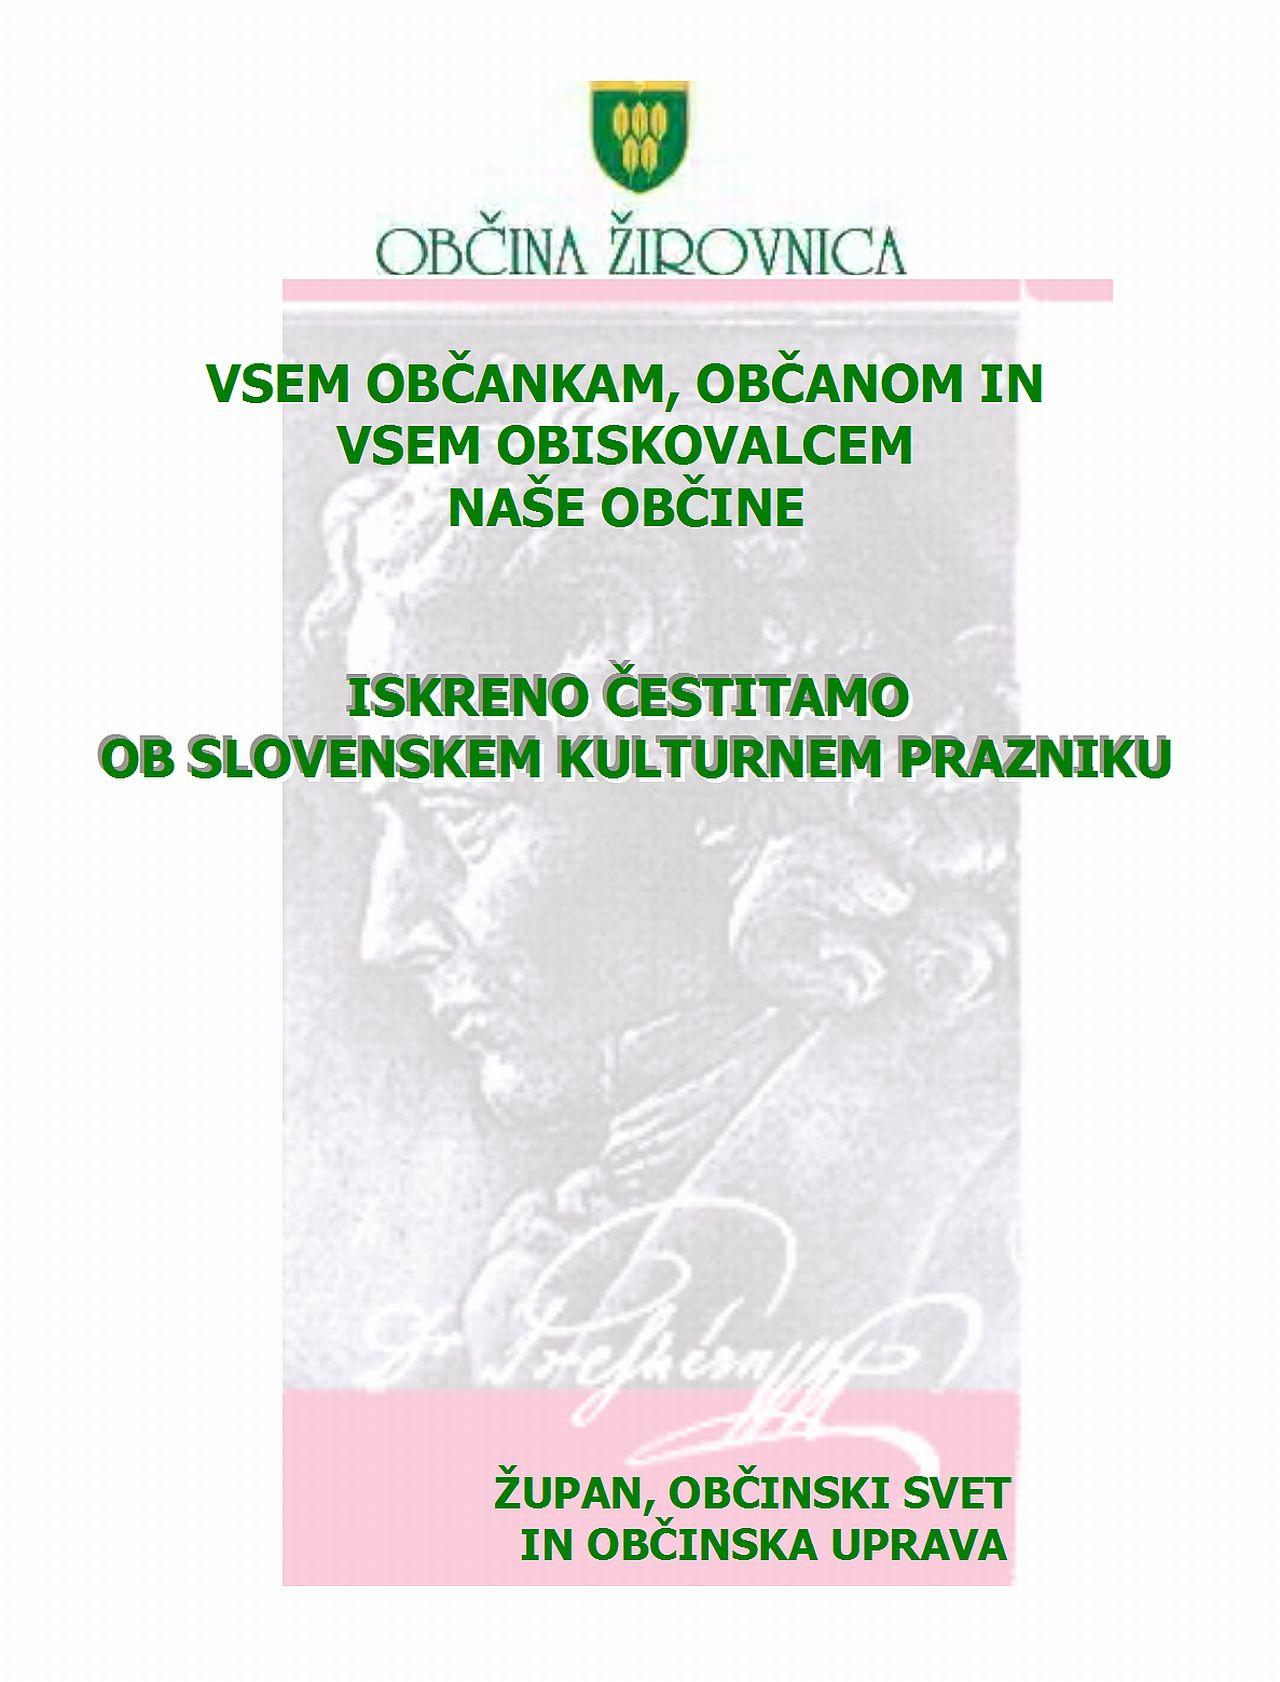 CESTITKA-8 FEBRUAR